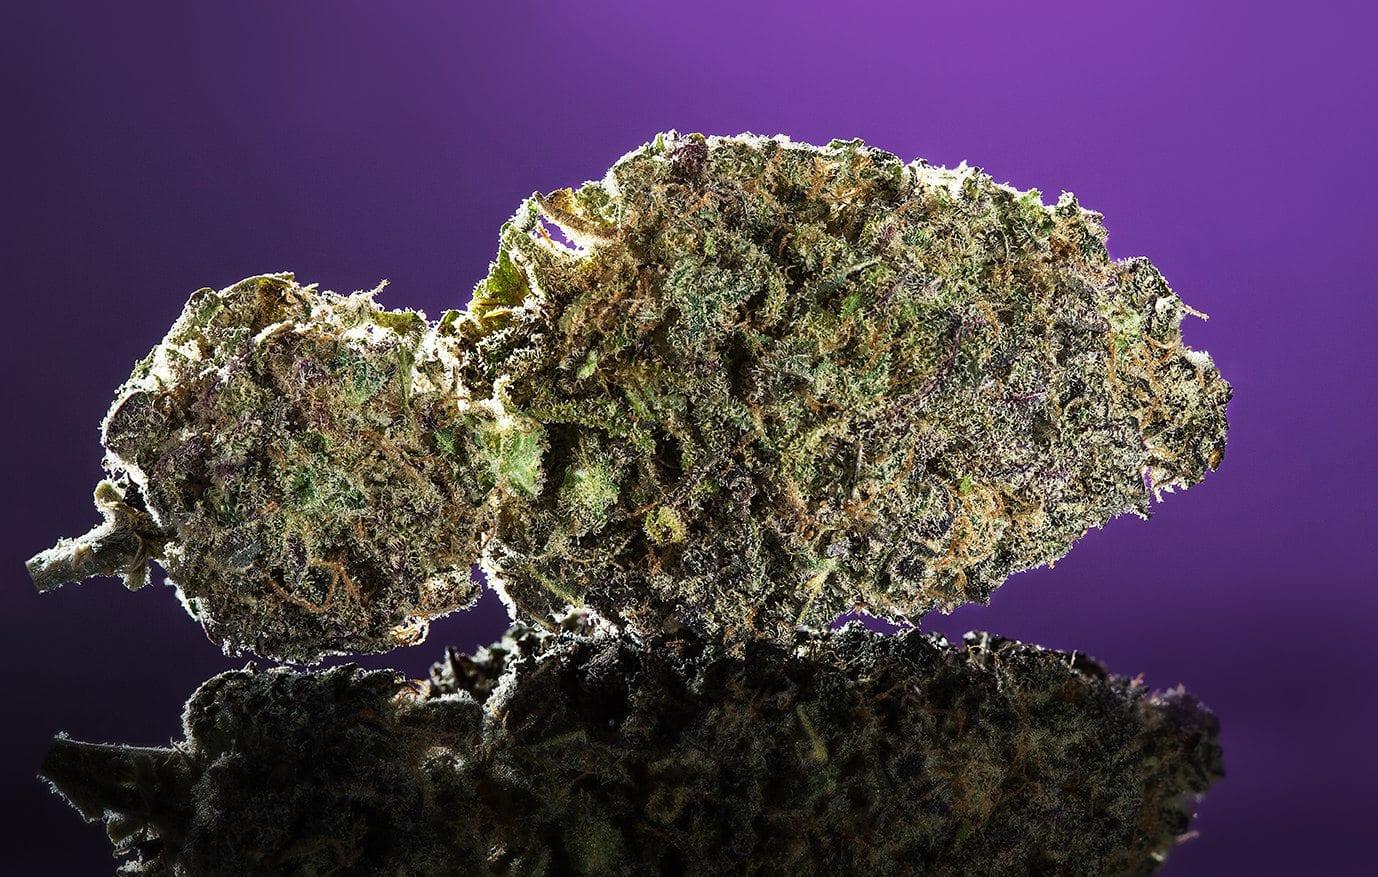 purple marijuana bud 28 - photo #4